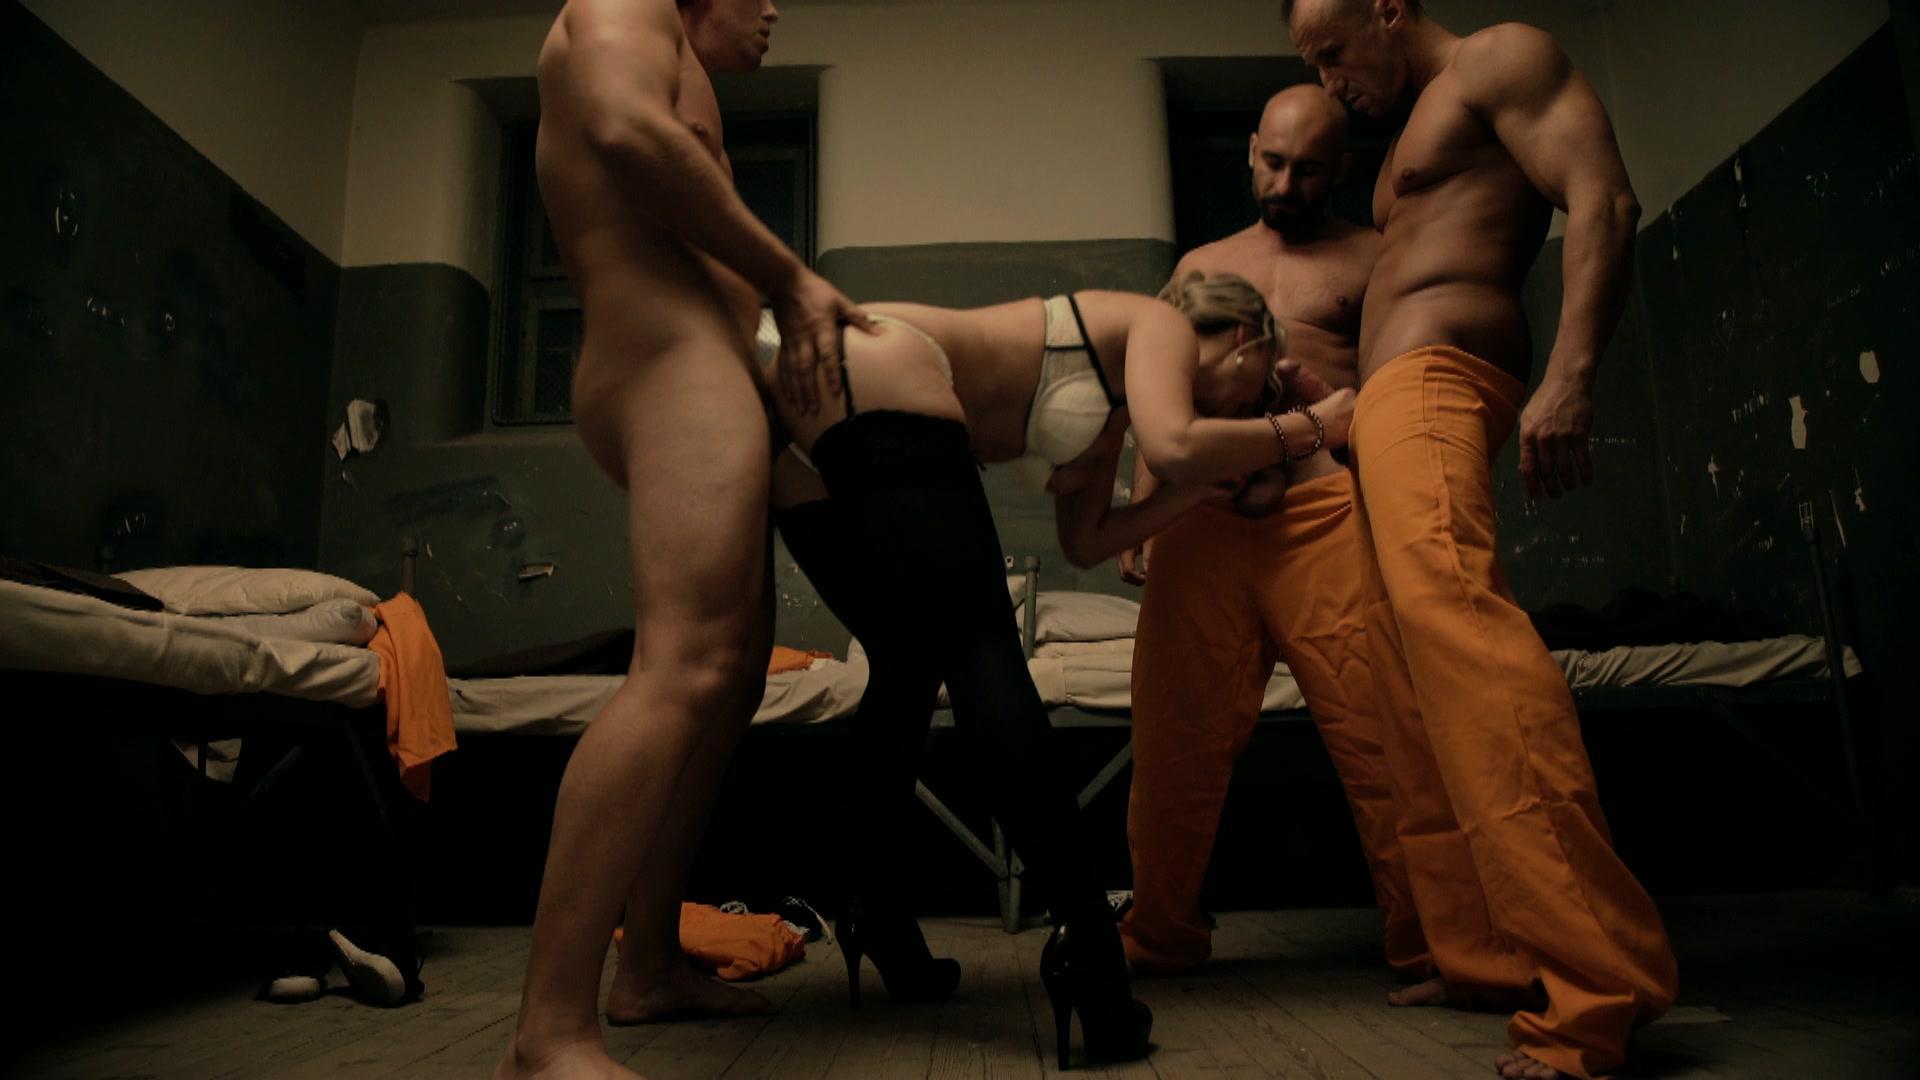 Jail gay porn